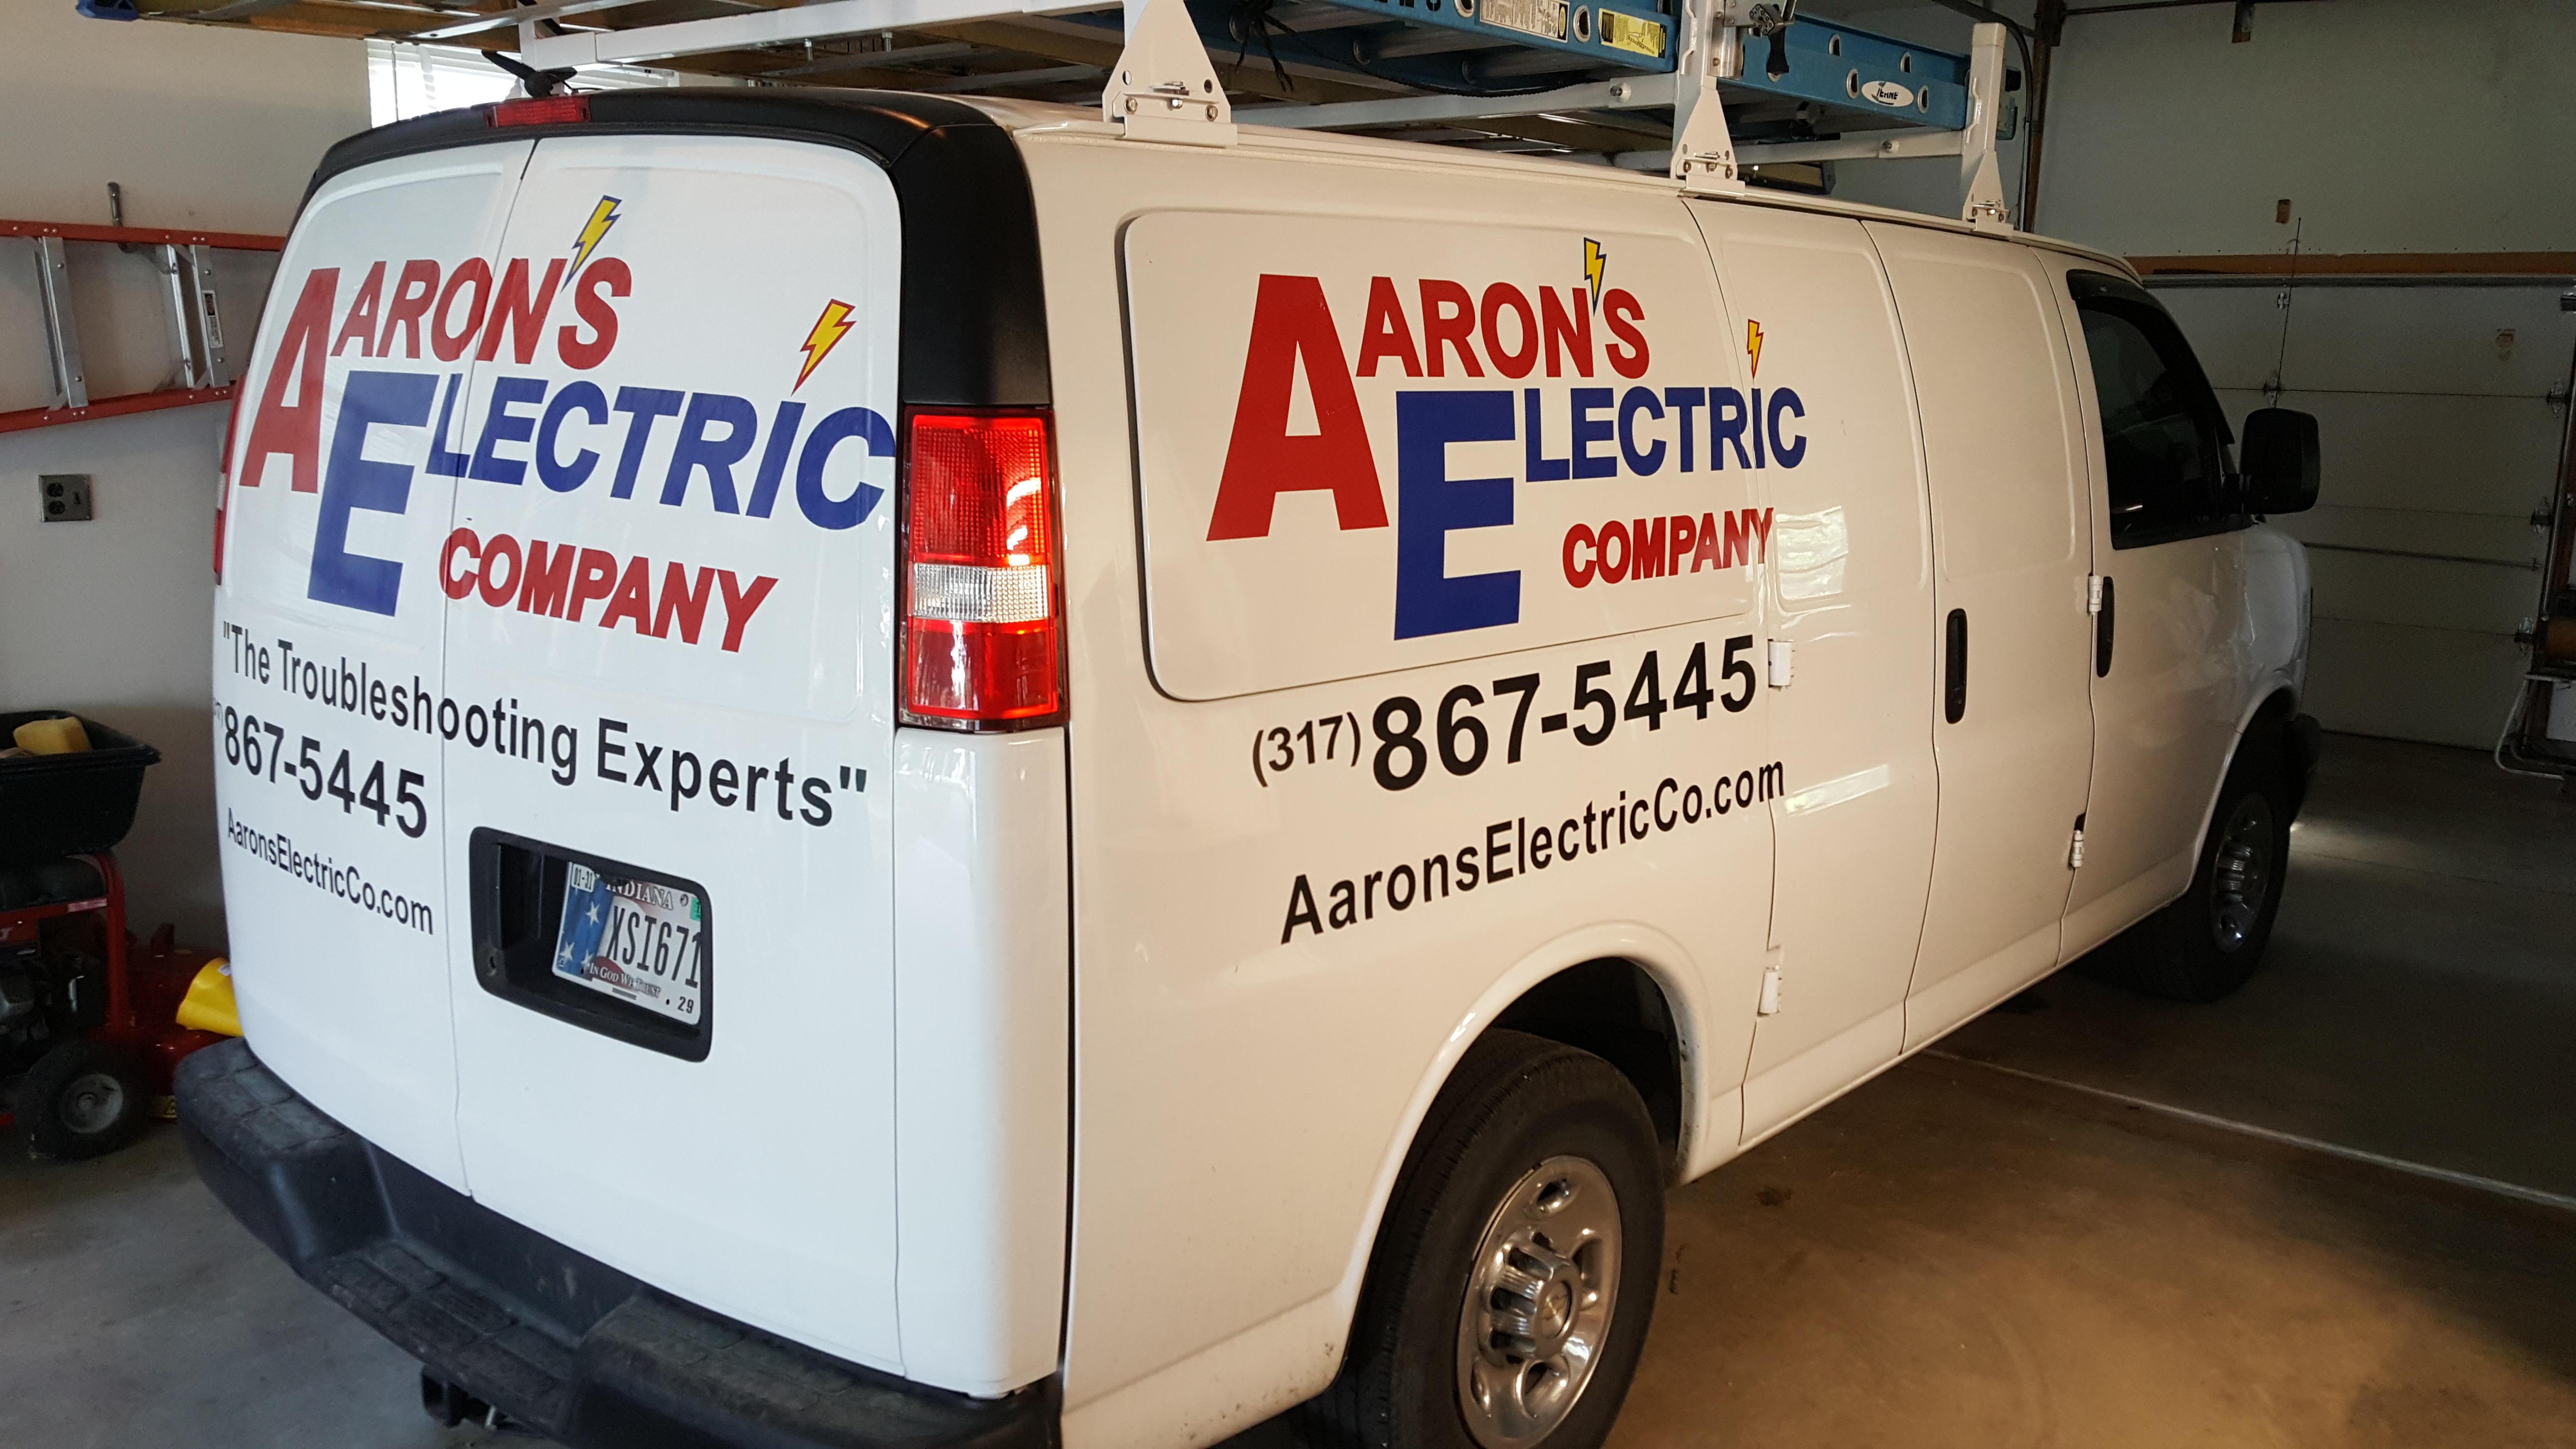 Aaron's Electric Company image 2